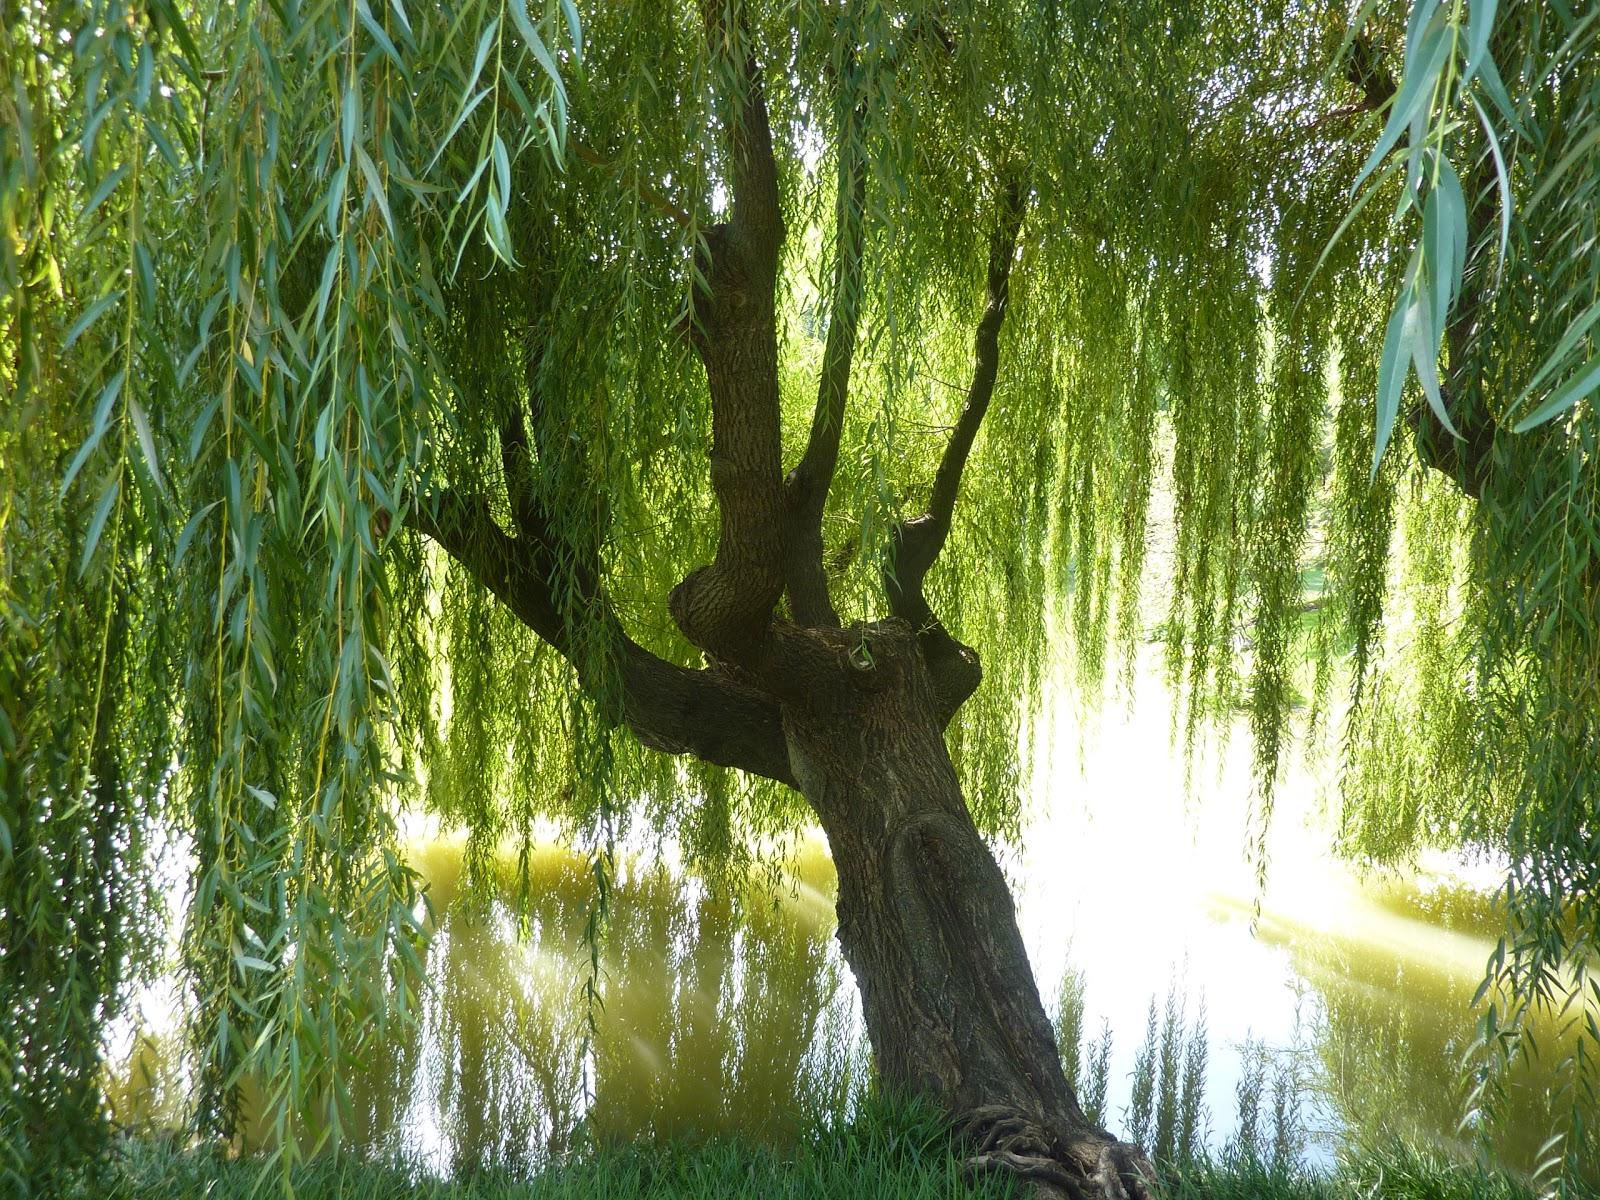 Weeping Willow Tree Wallpaper Beautiful willow tree 1600x1200